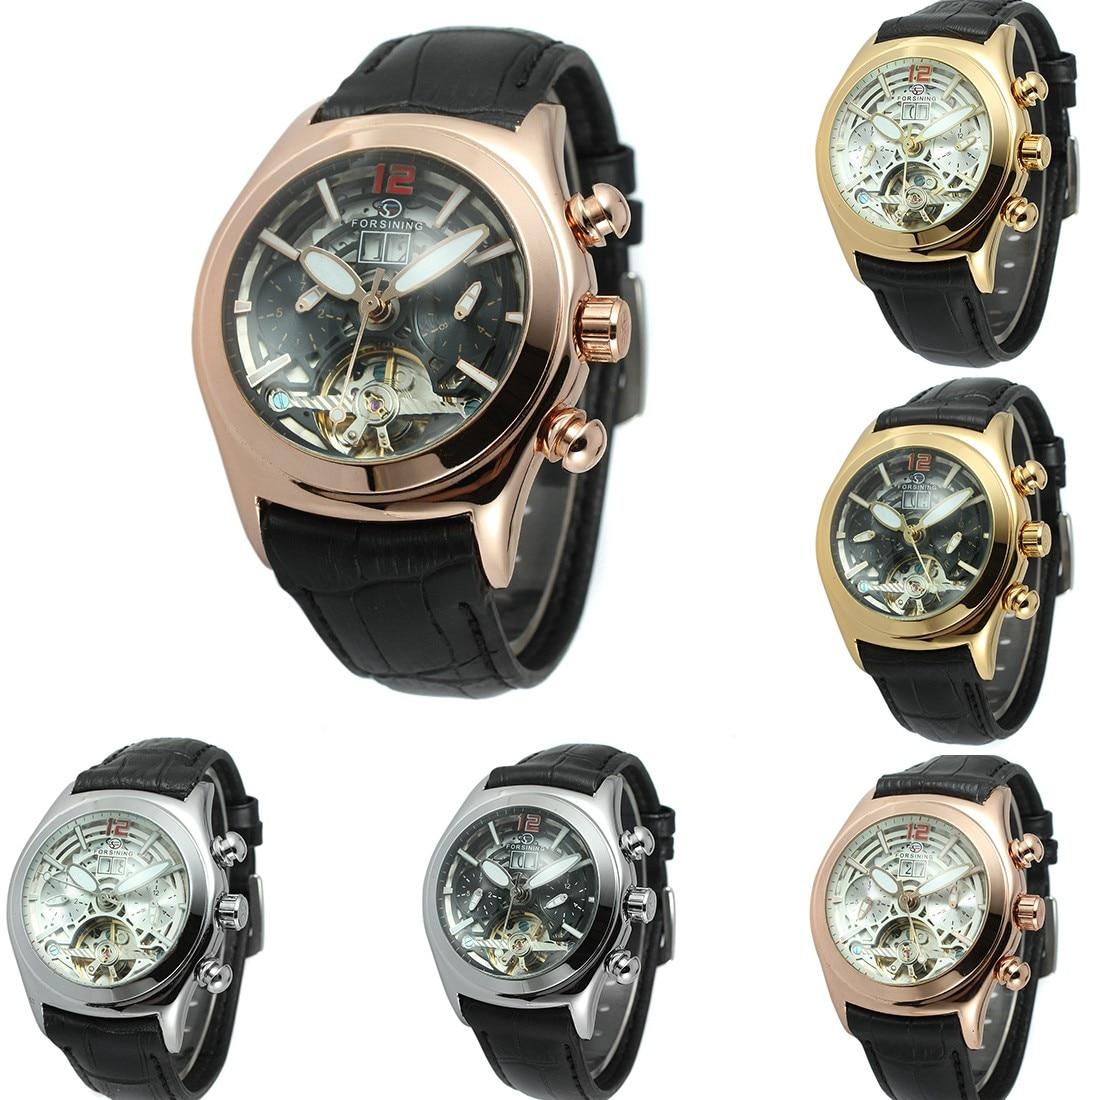 ФОТО Tourbillon Watches Luxury Men Mechanical Watches Fashion Design Men Watch Hours High Quality Accessories